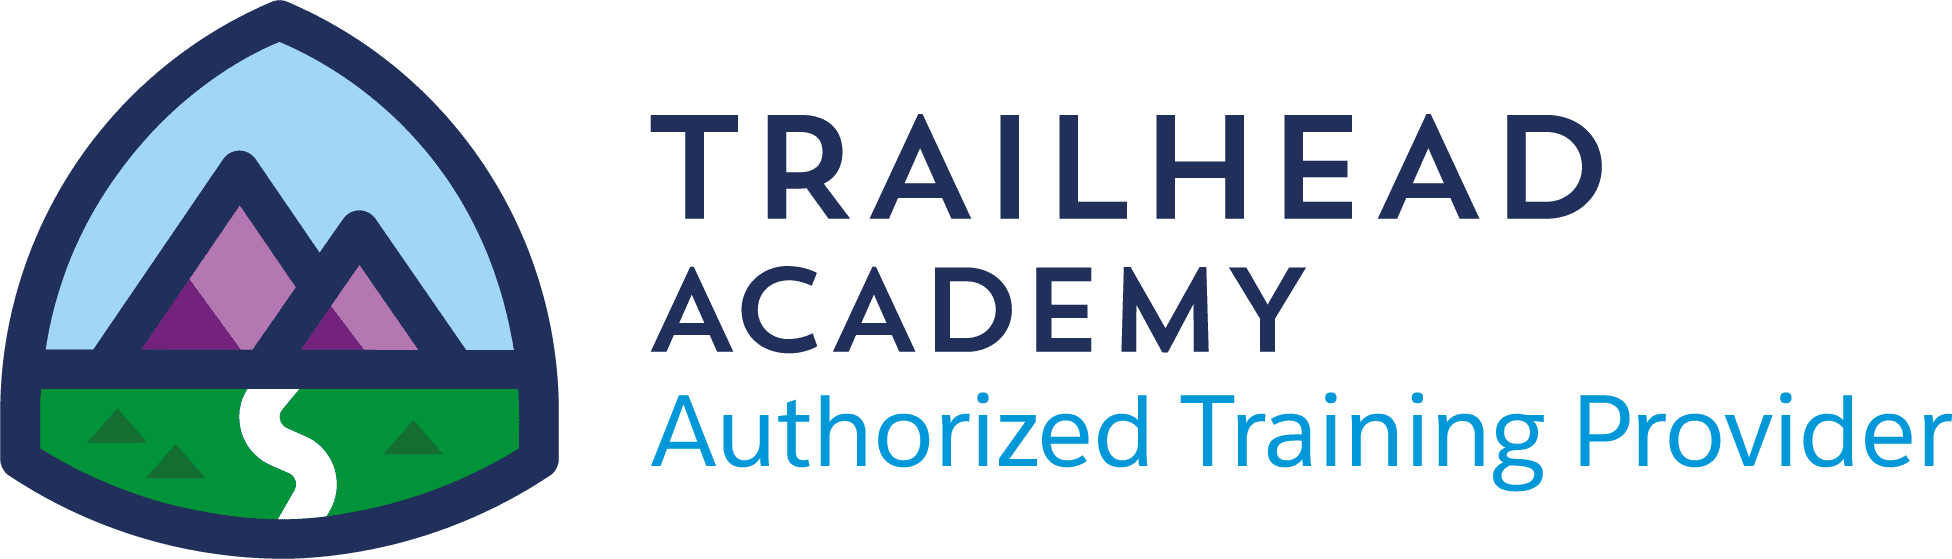 Salesforce Trailhead Academy logo